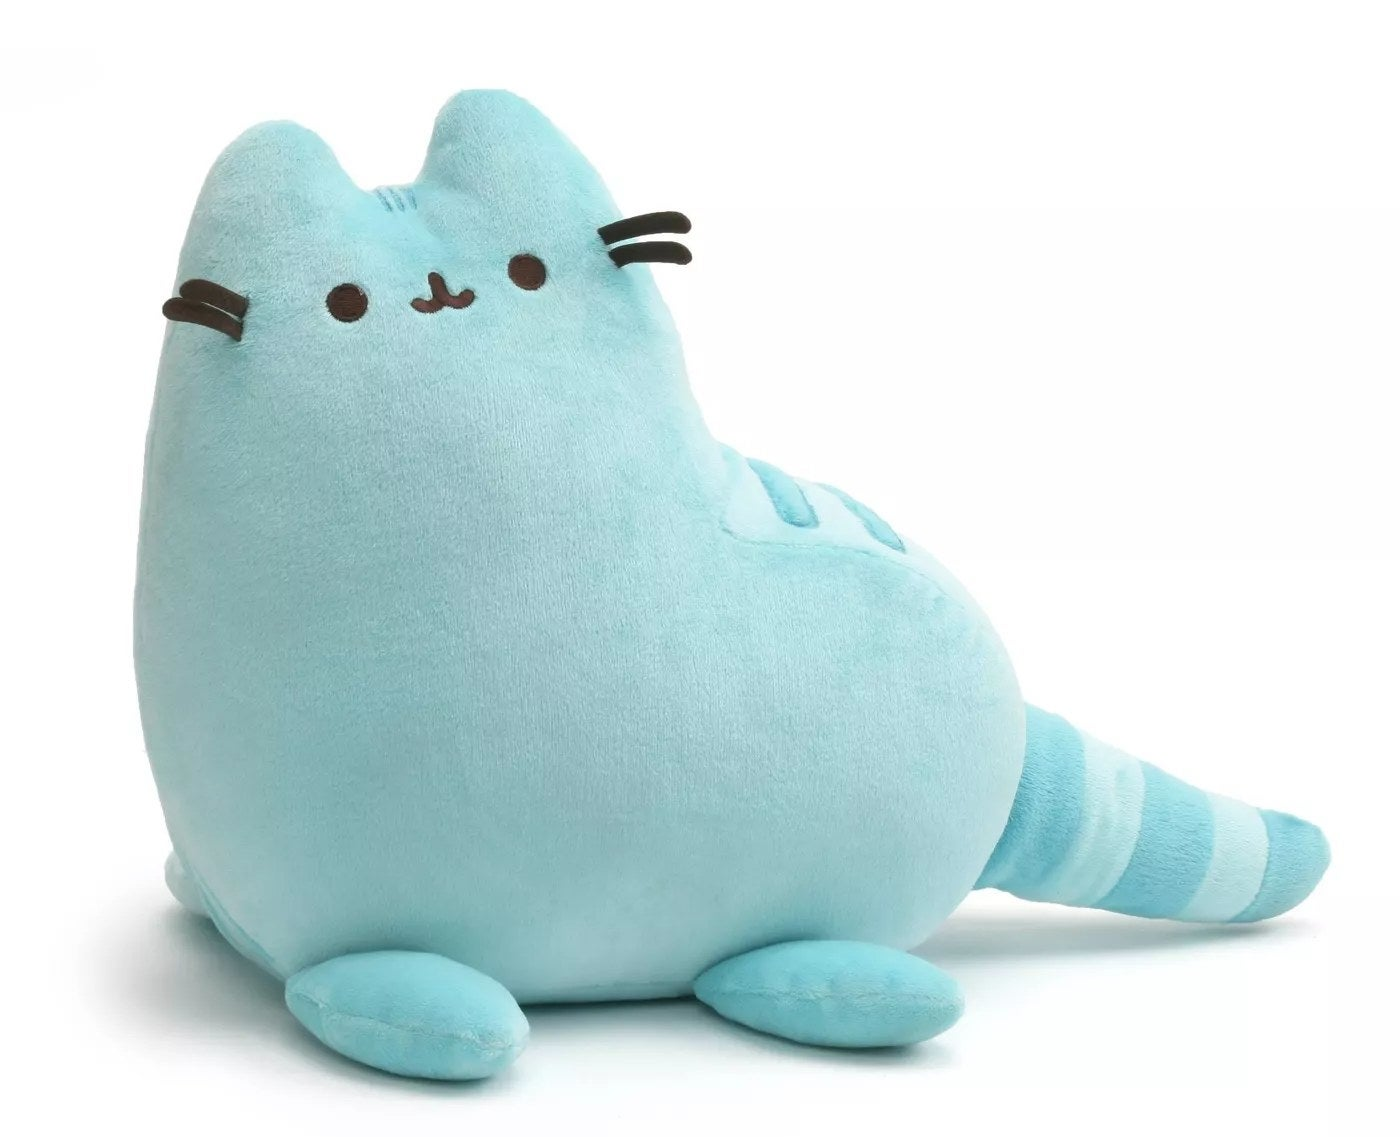 The blue cat plush toy